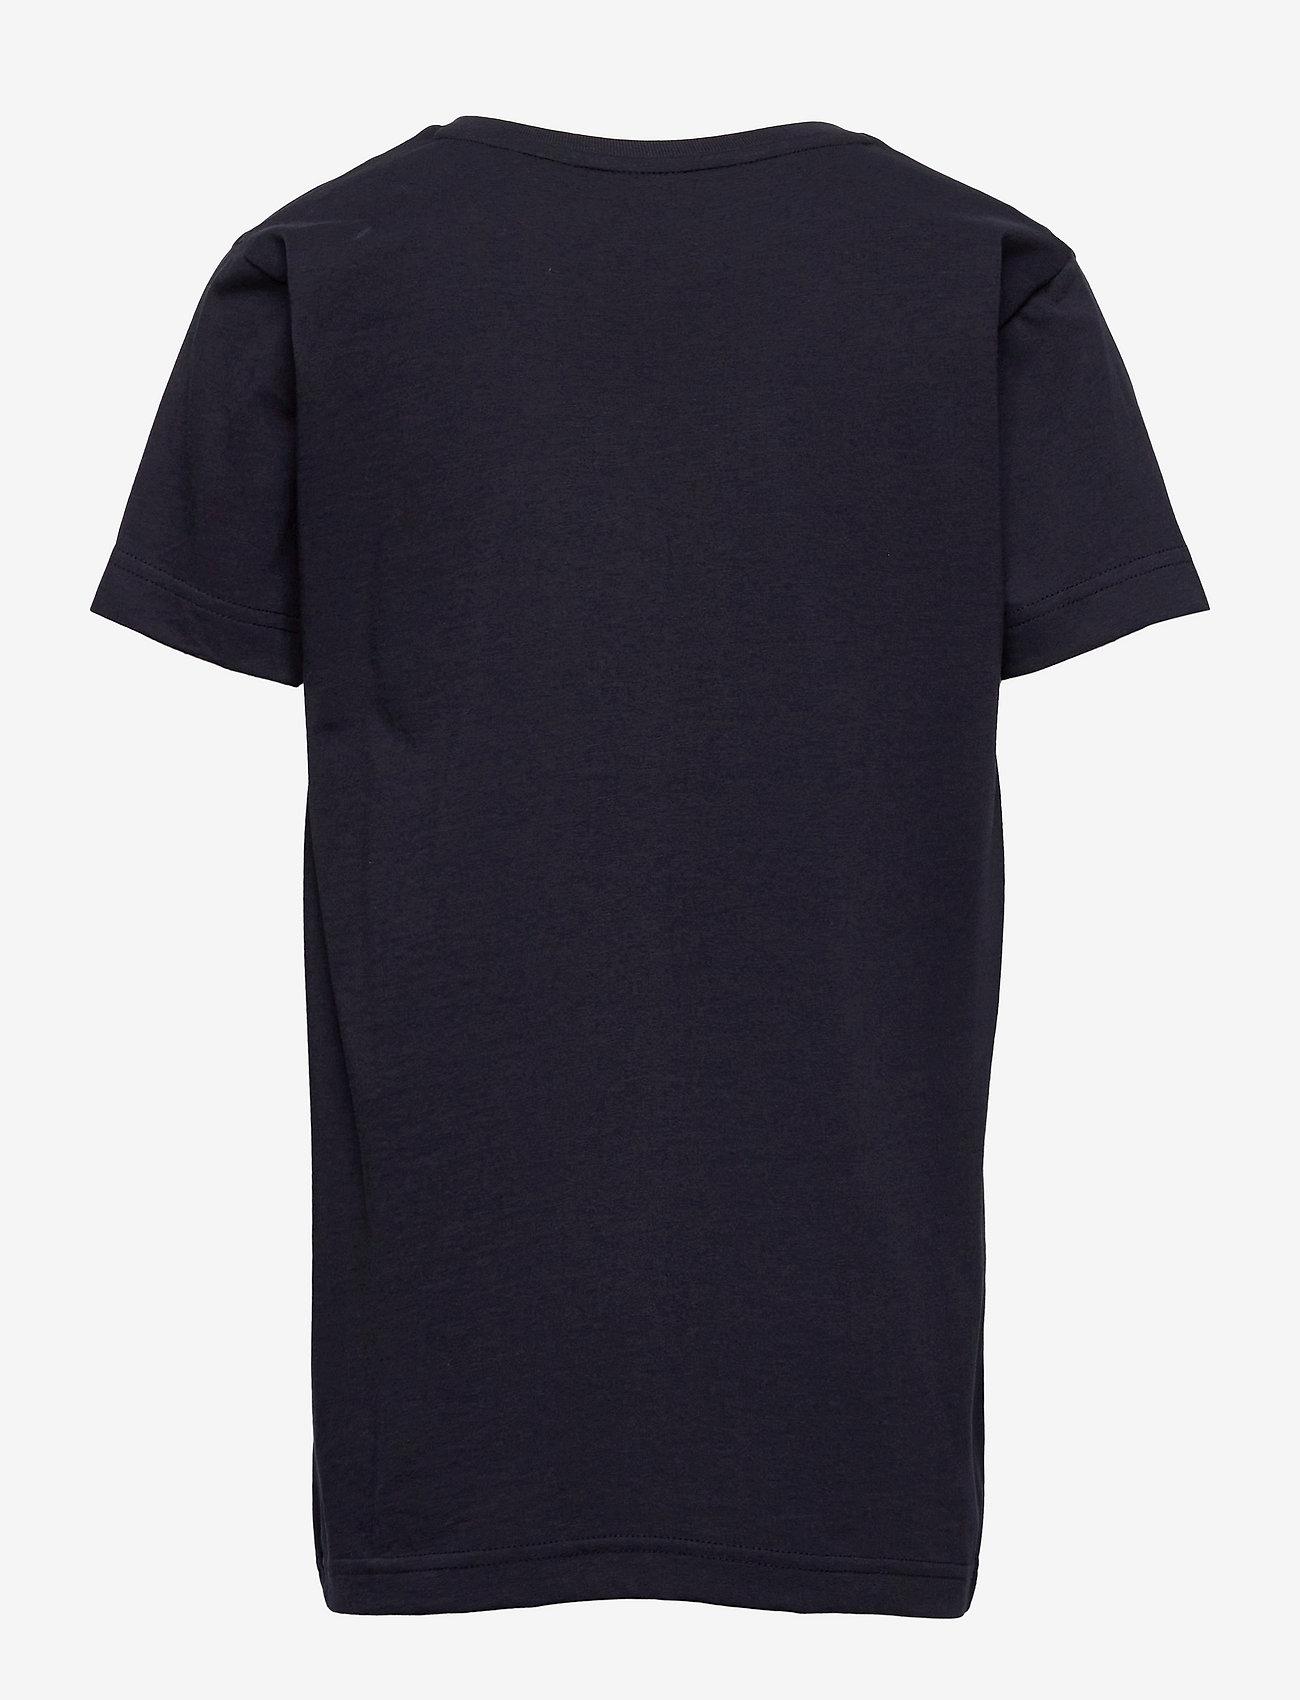 GANT - ARCHIVE SHIELD EMB SS T-SHIRT - short-sleeved - evening blue - 1